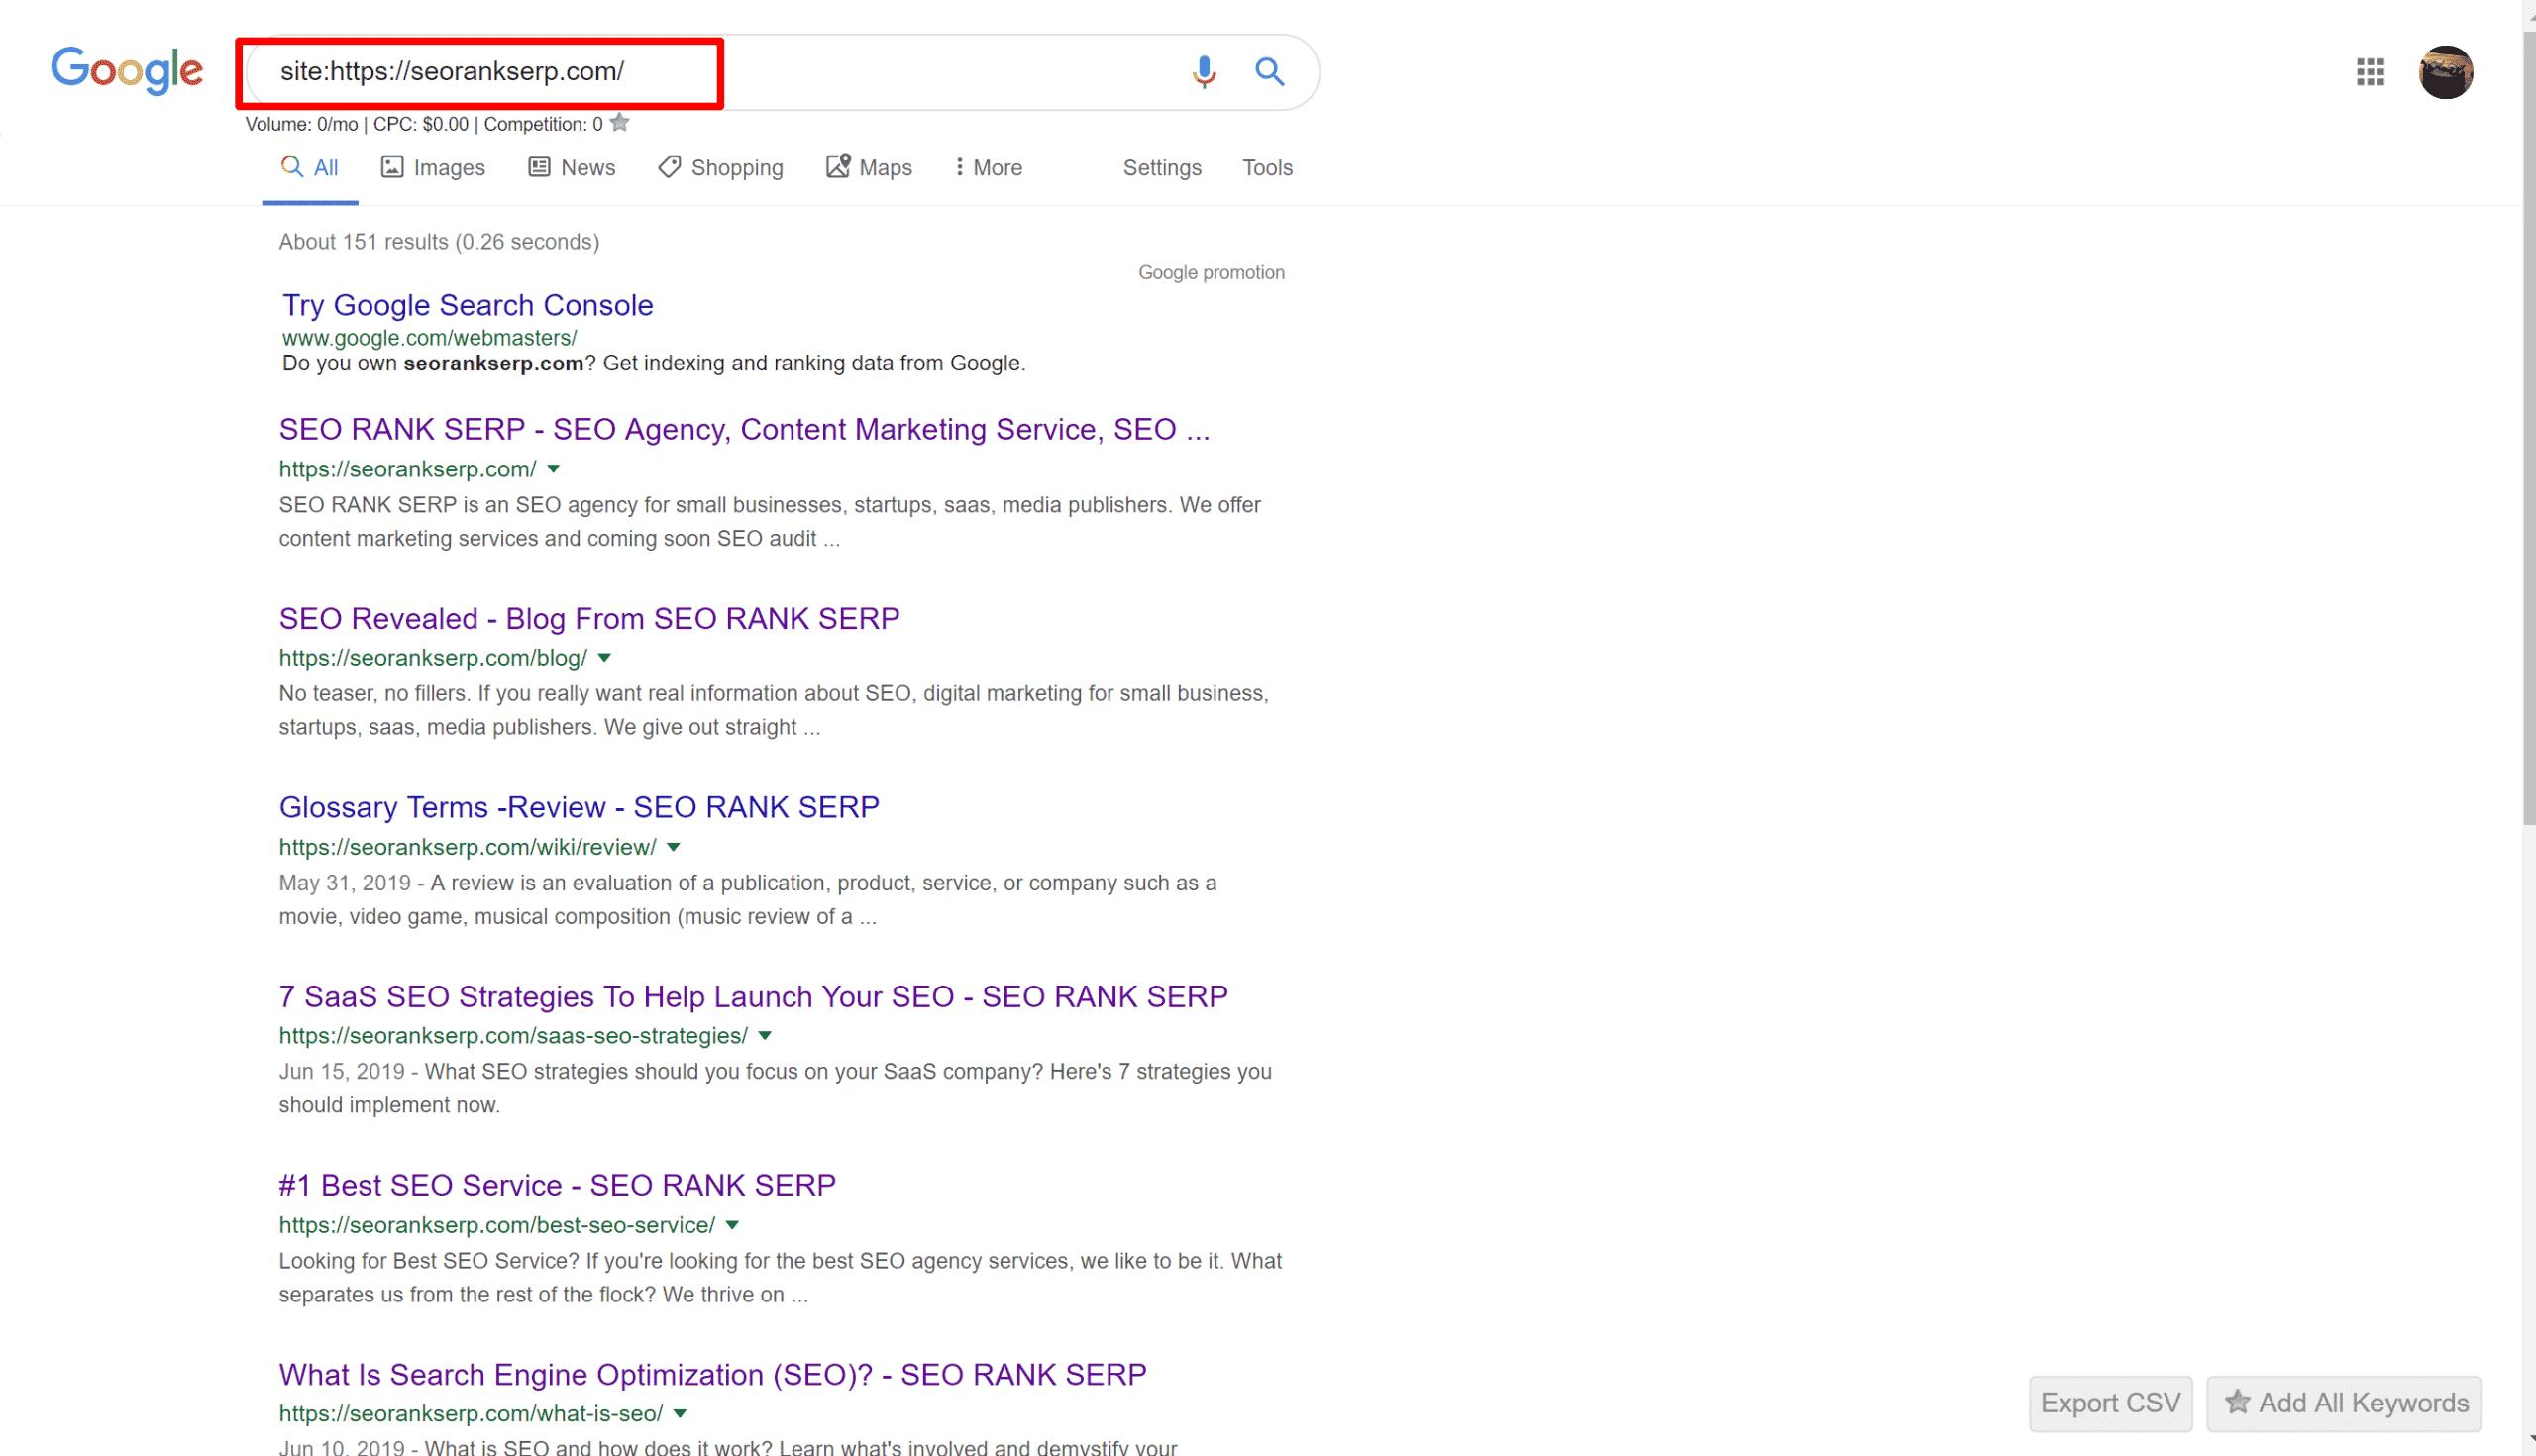 google search site:https://seorankserp.com/